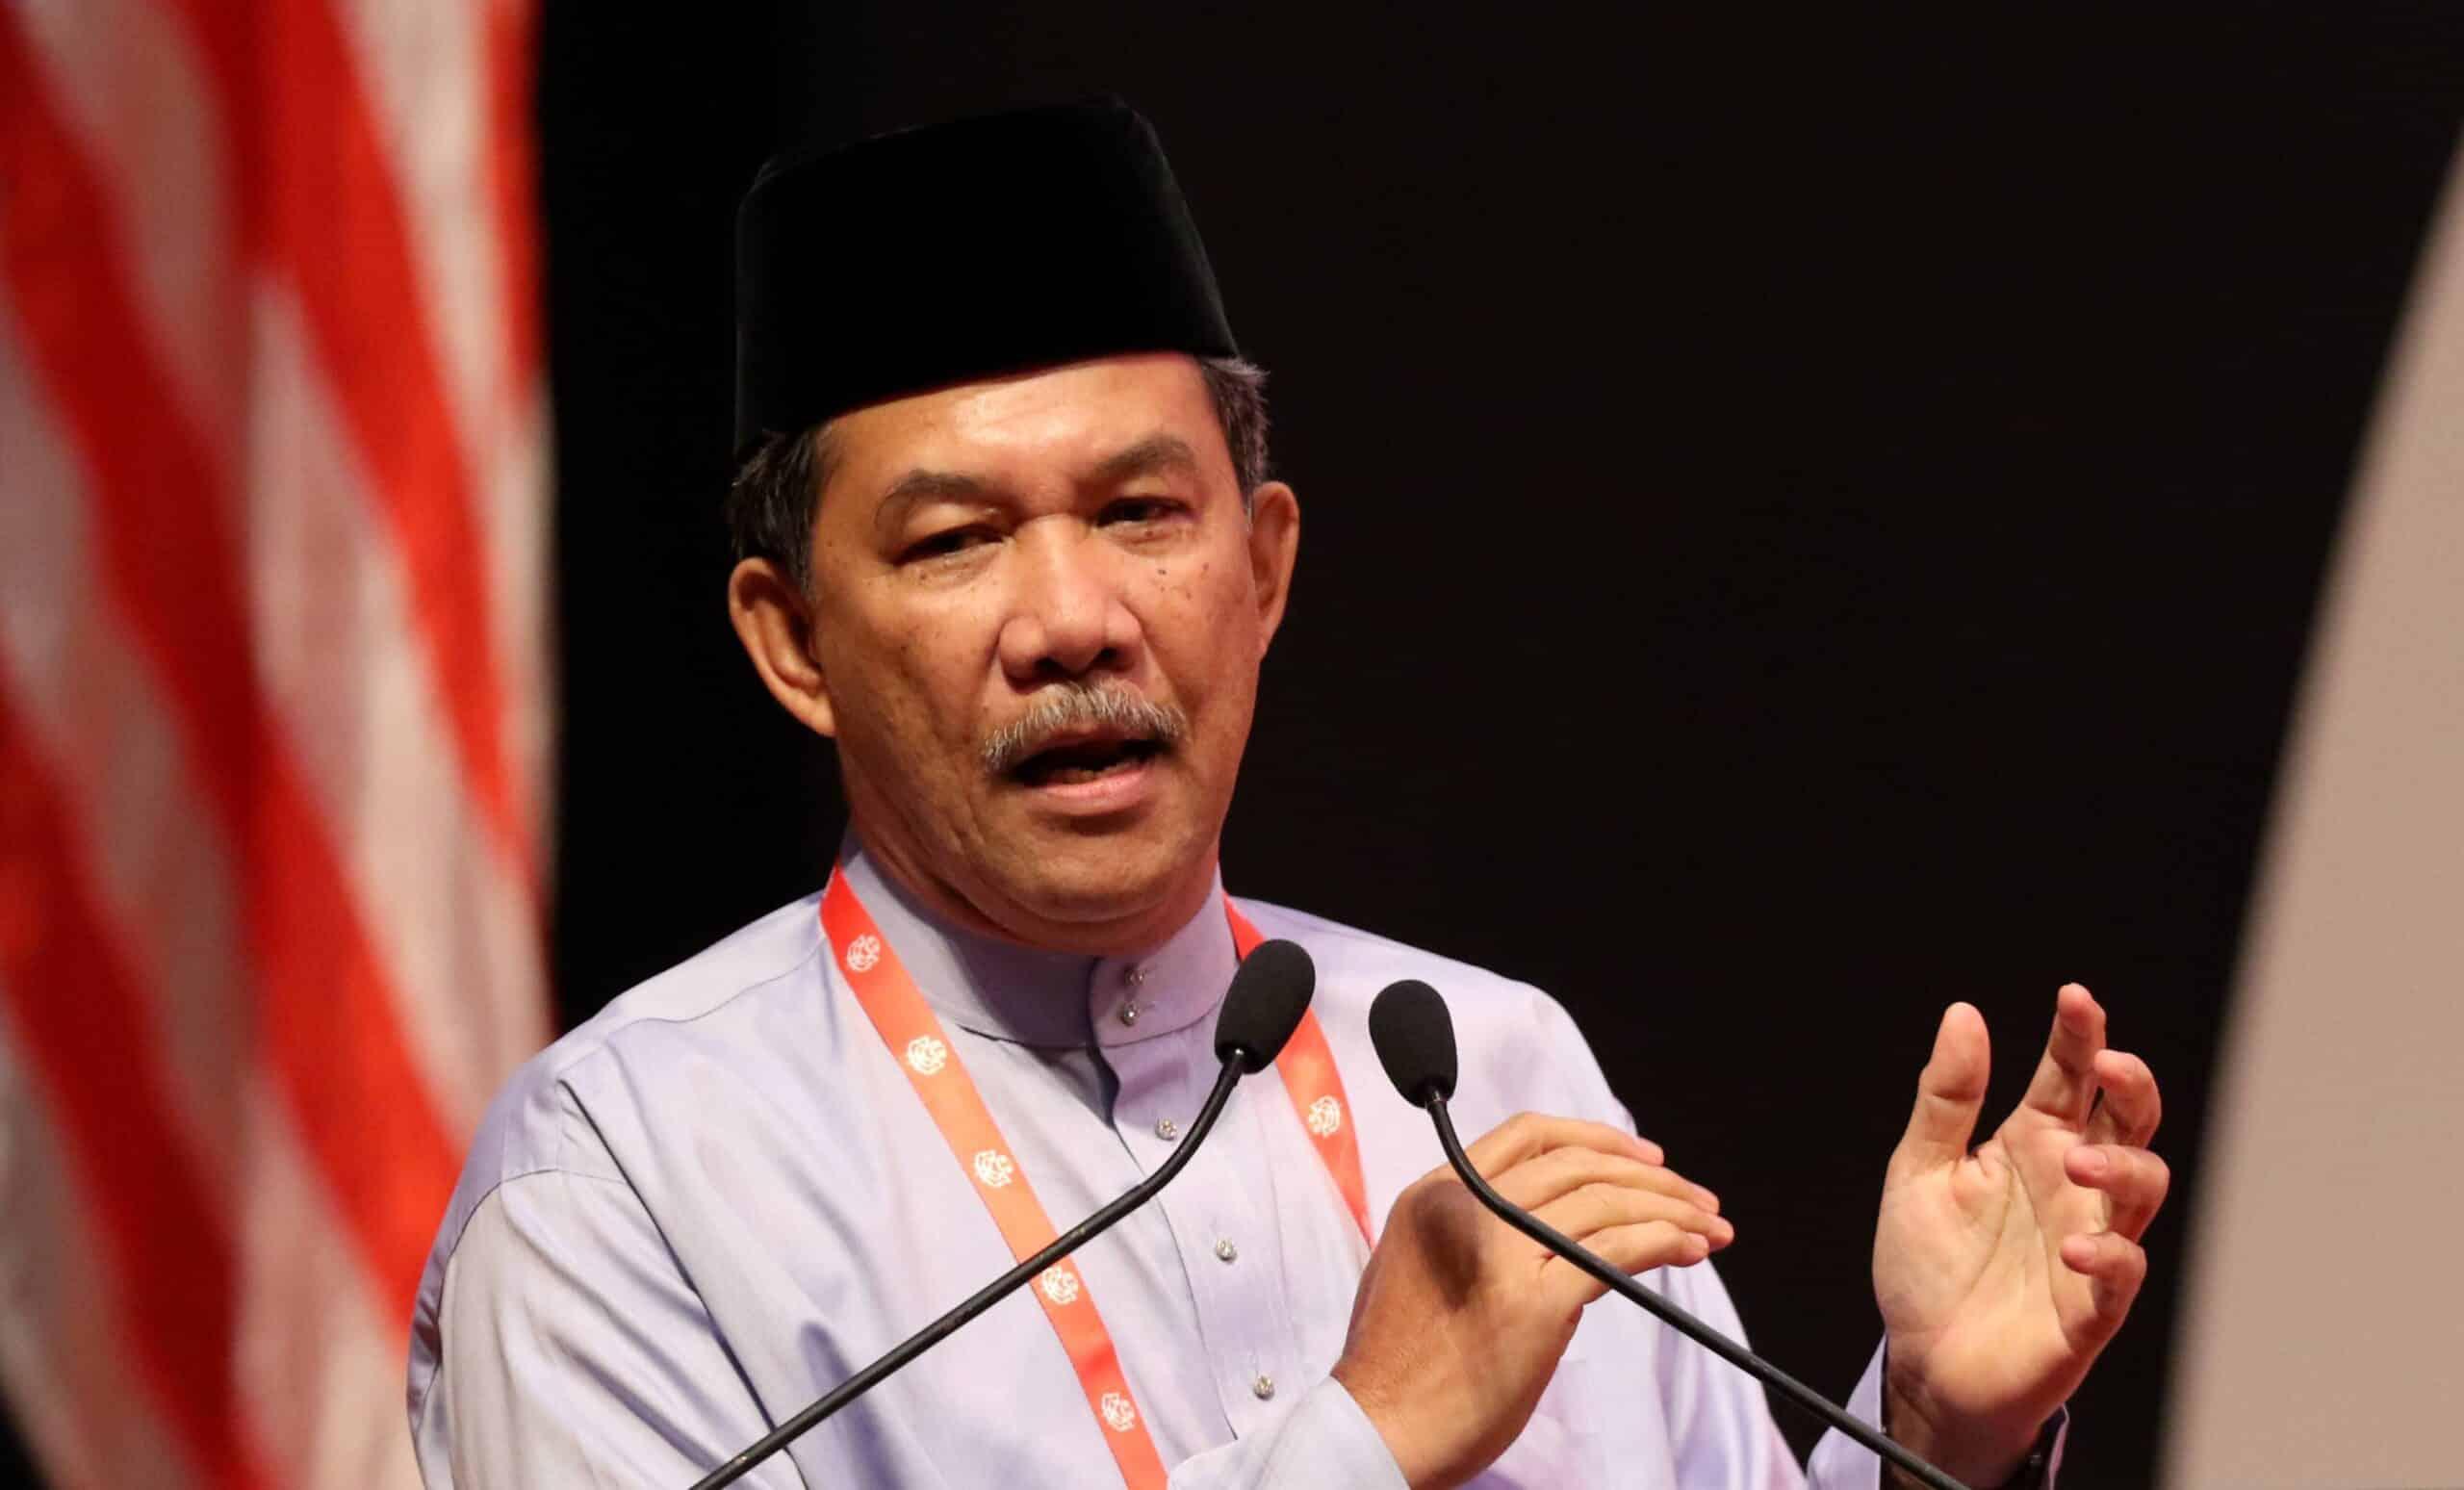 UMNO Diketepikan Dengan Cara Yang Tidak Adil – Mohamad Hasan